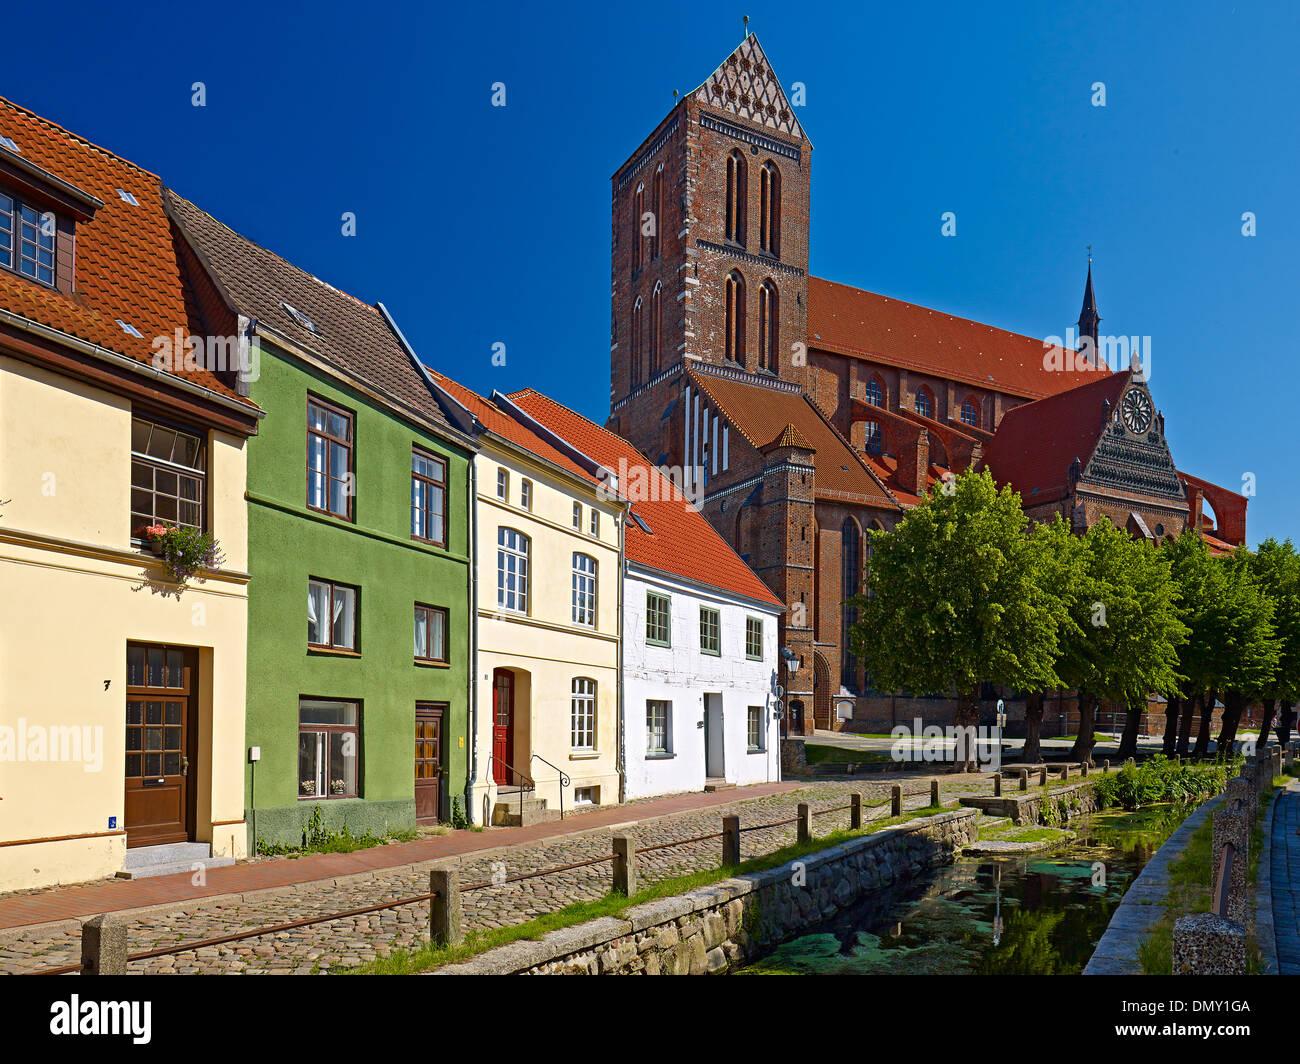 Frische Grube River with St. Nicholas Church in Wismar, Mecklenburg-Vorpommern, Germany - Stock Image